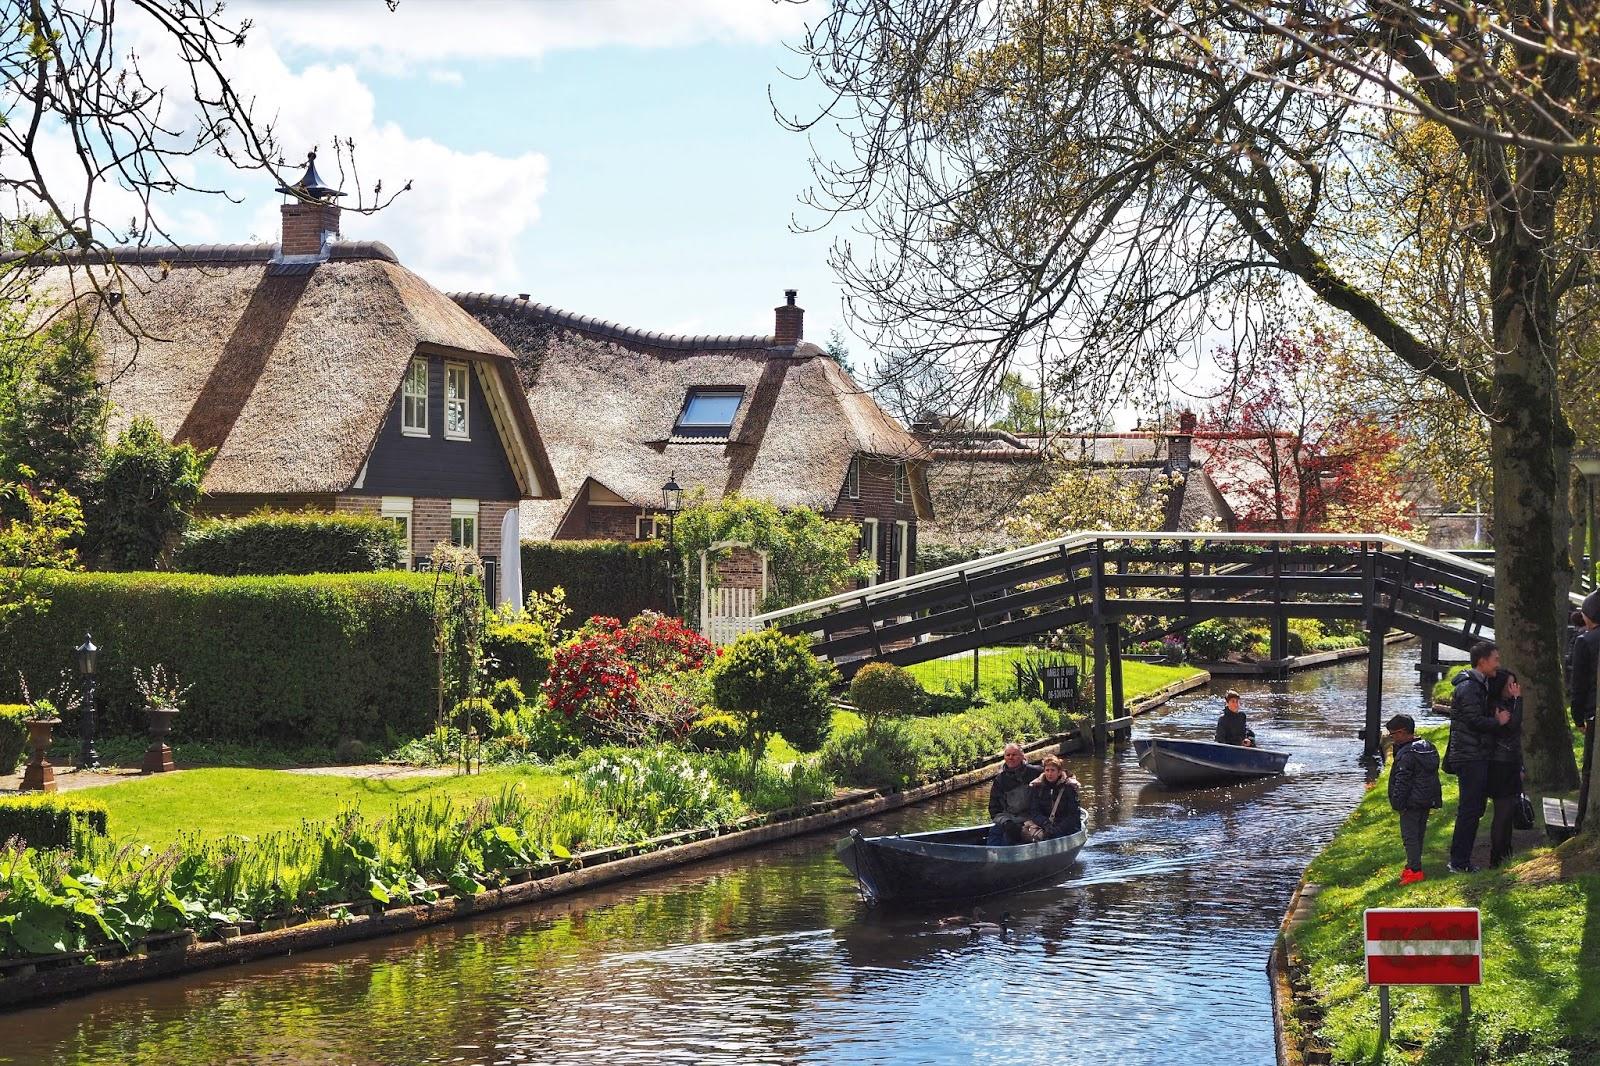 rx-78-2: 荷蘭~D7~羊角村(上) Giethoorn